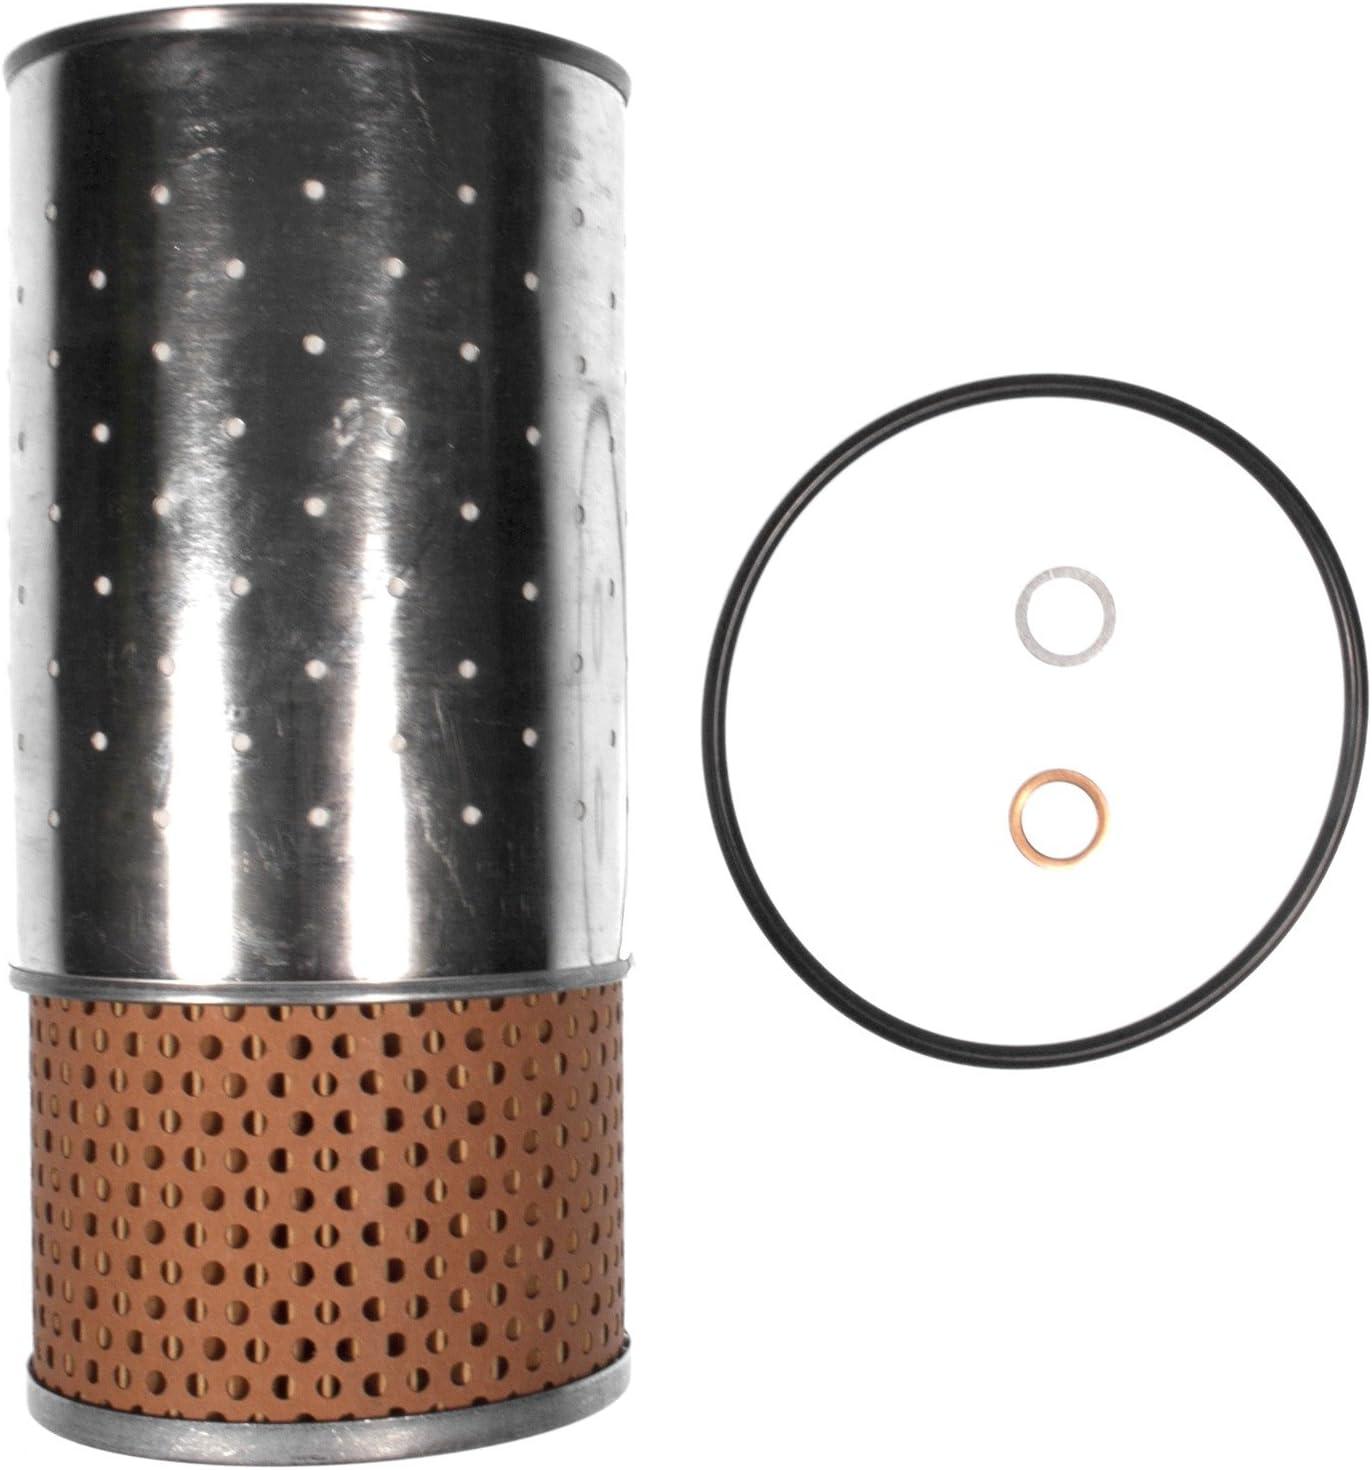 MAHLE Original OX 78D Oil Filter